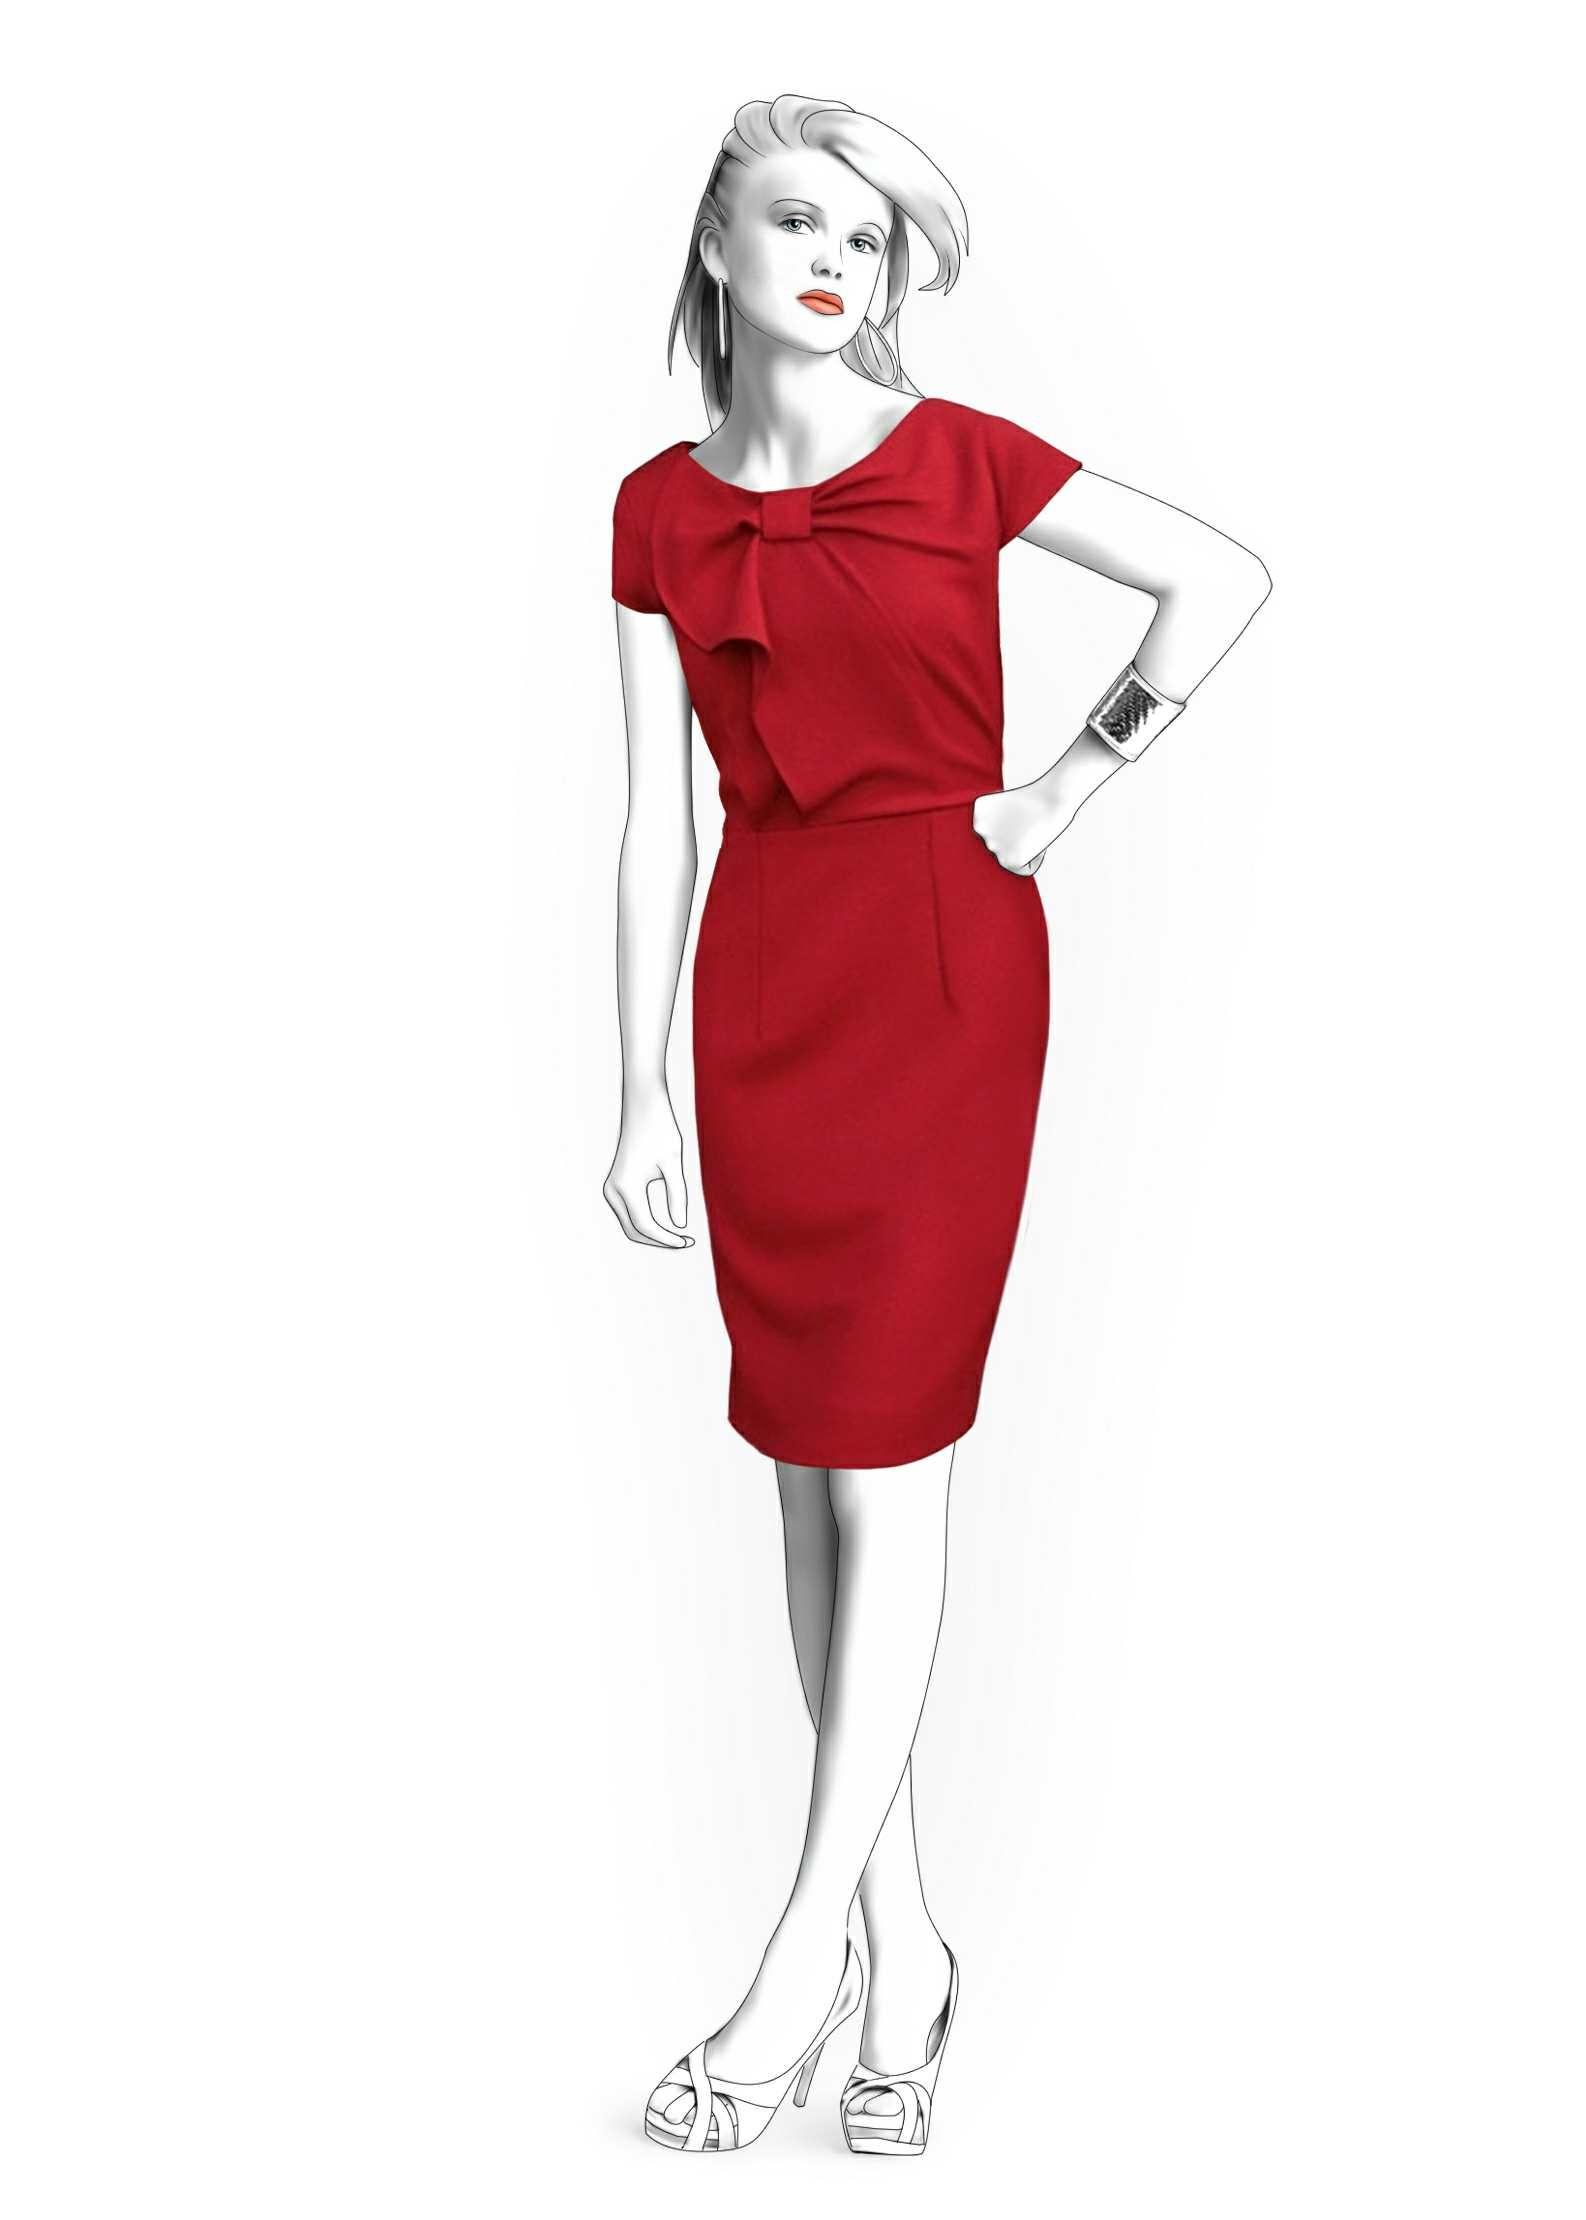 http://leko-mail.net/bi/4361.jpg | 칵테일 드레스 | Pinterest | Dress ...